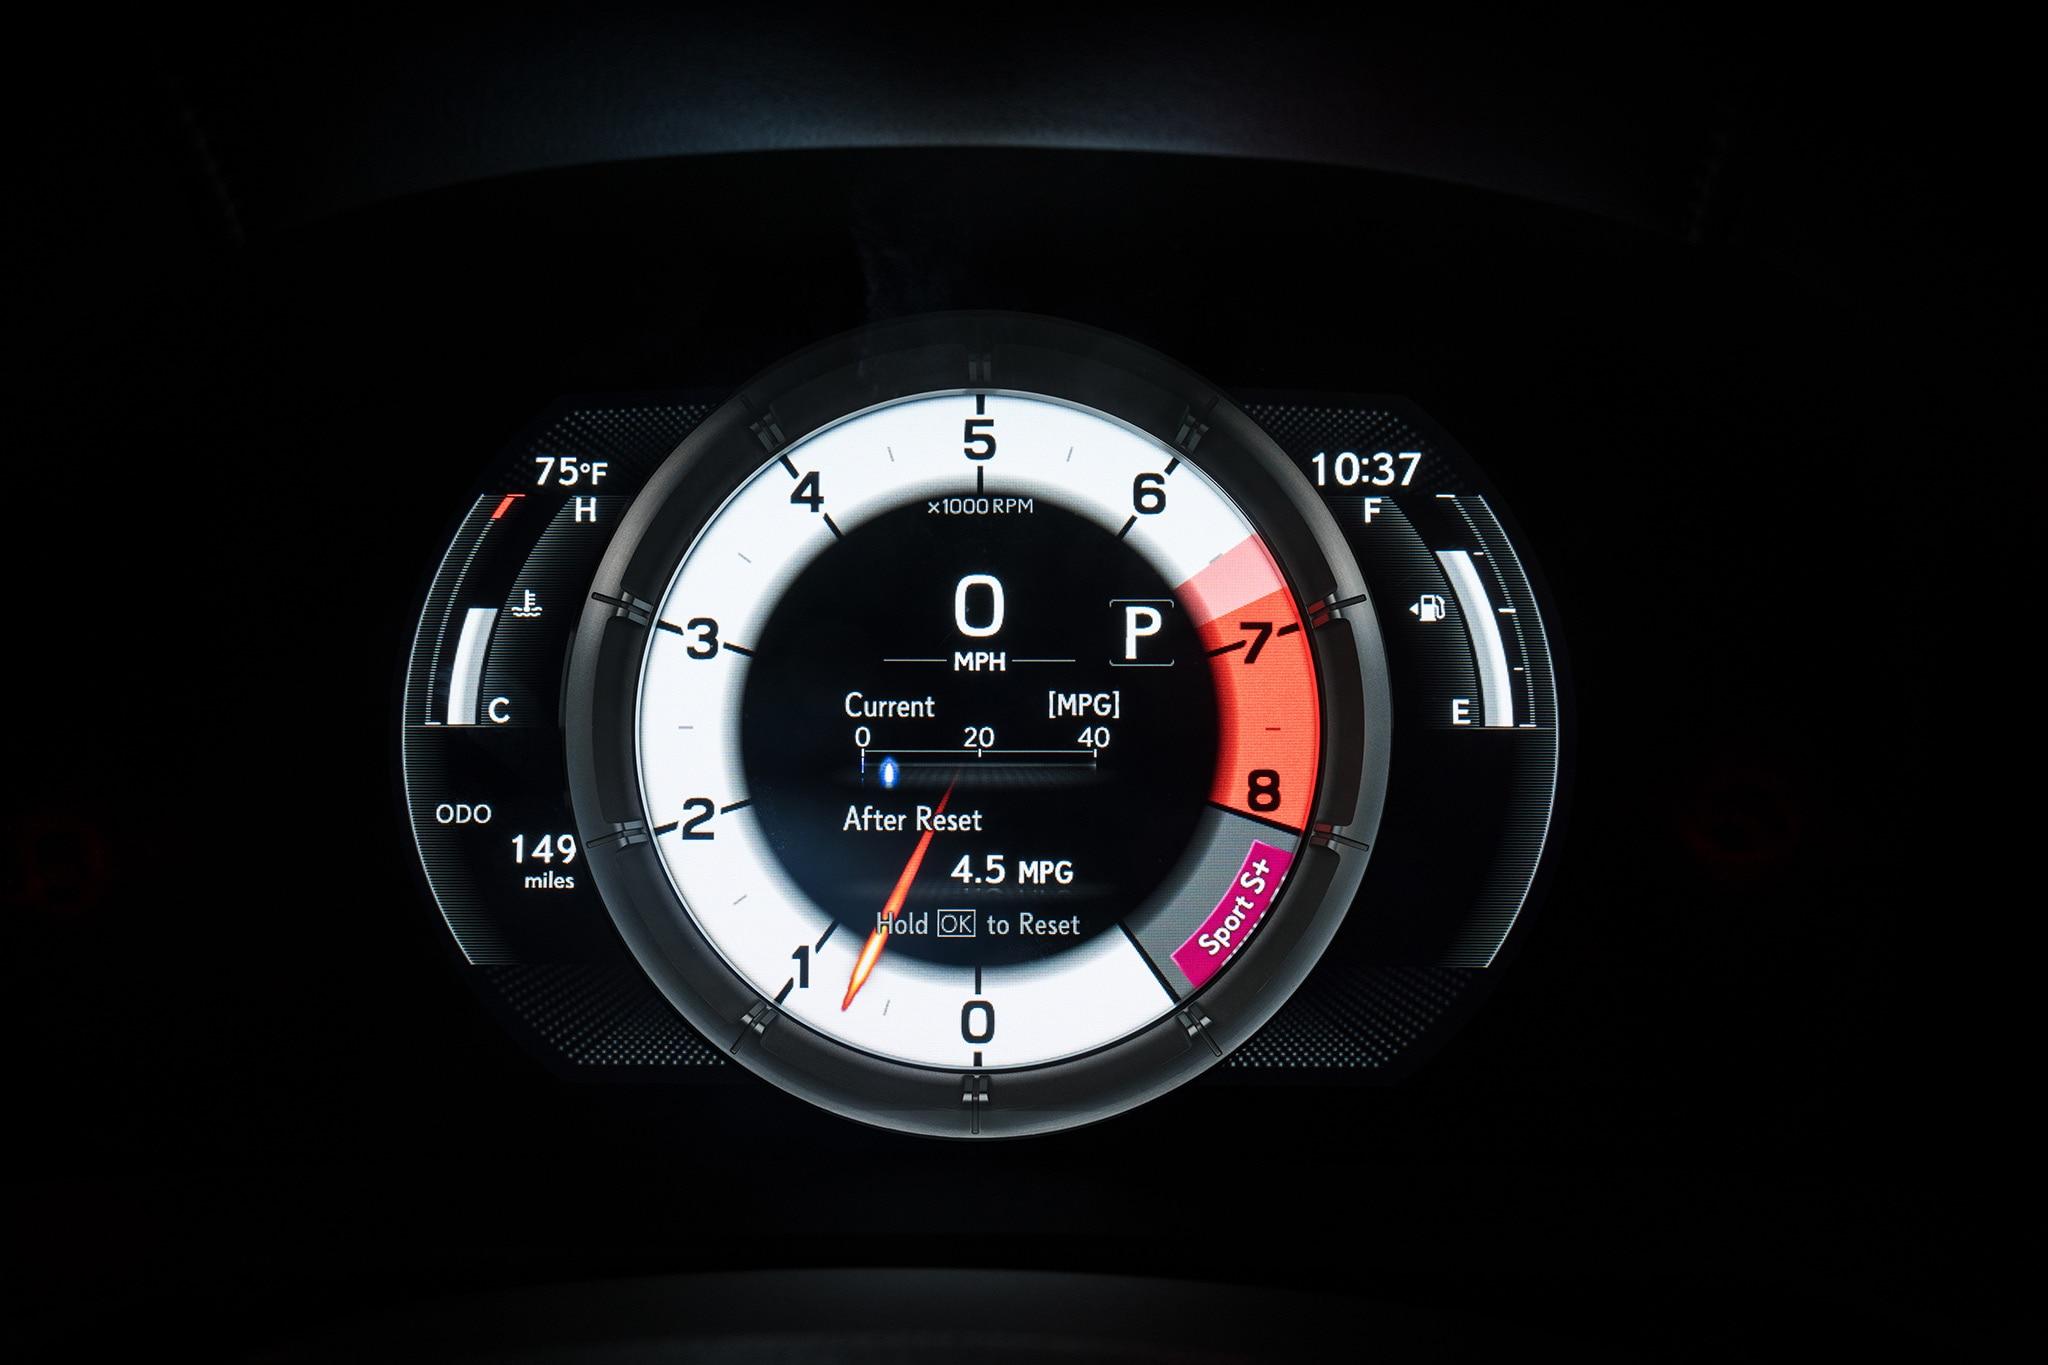 GALLERY: 2019 Lexus ES 350 F-Sport | Automobile Magazine